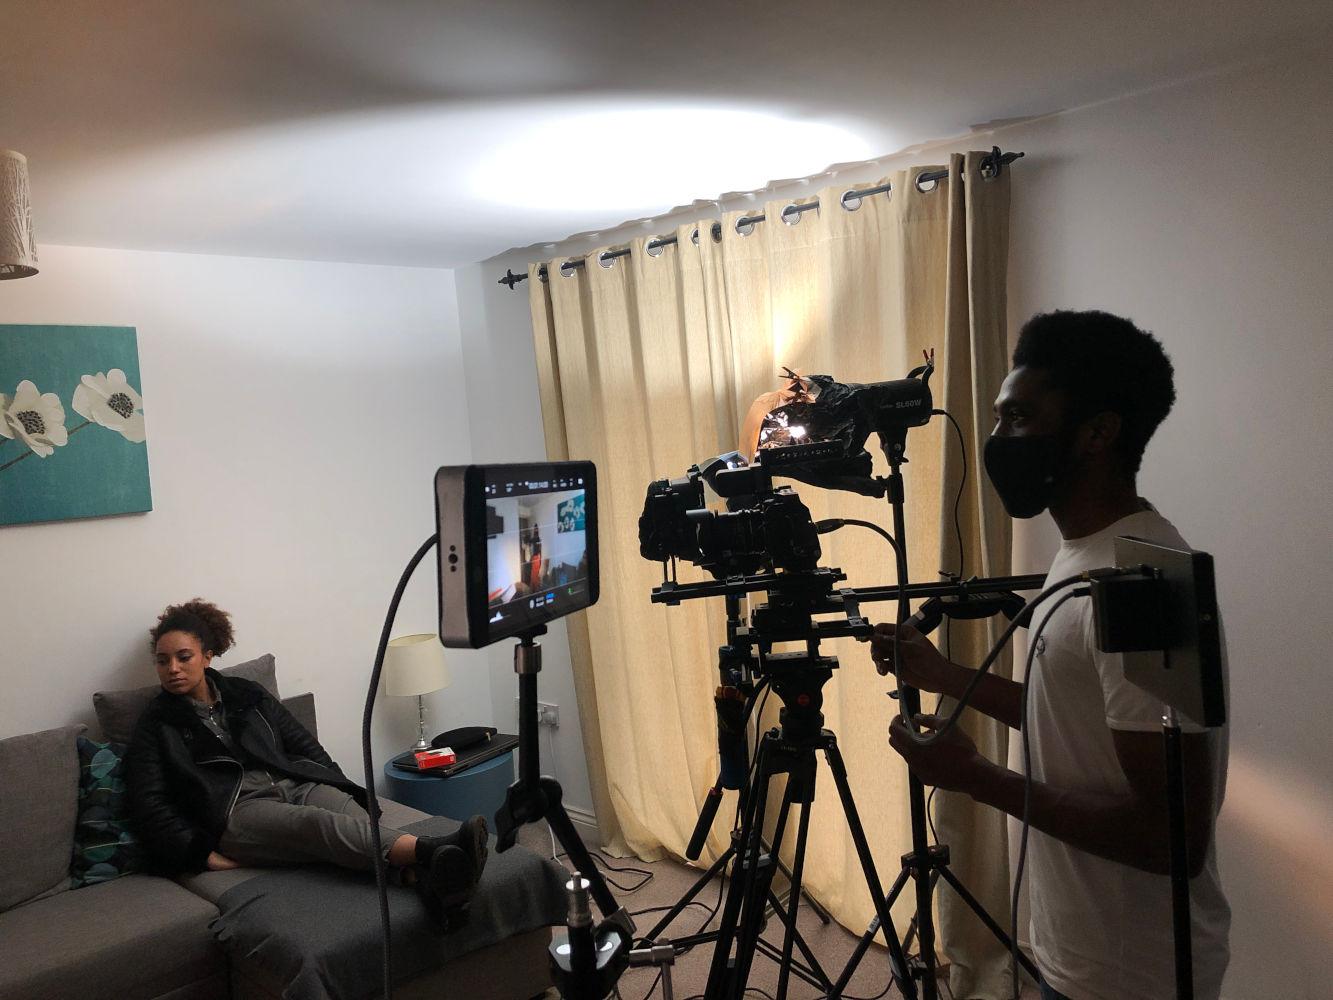 Behind the scenes image from Liam Calvert's Voyager short film of DoP Matthias Djan